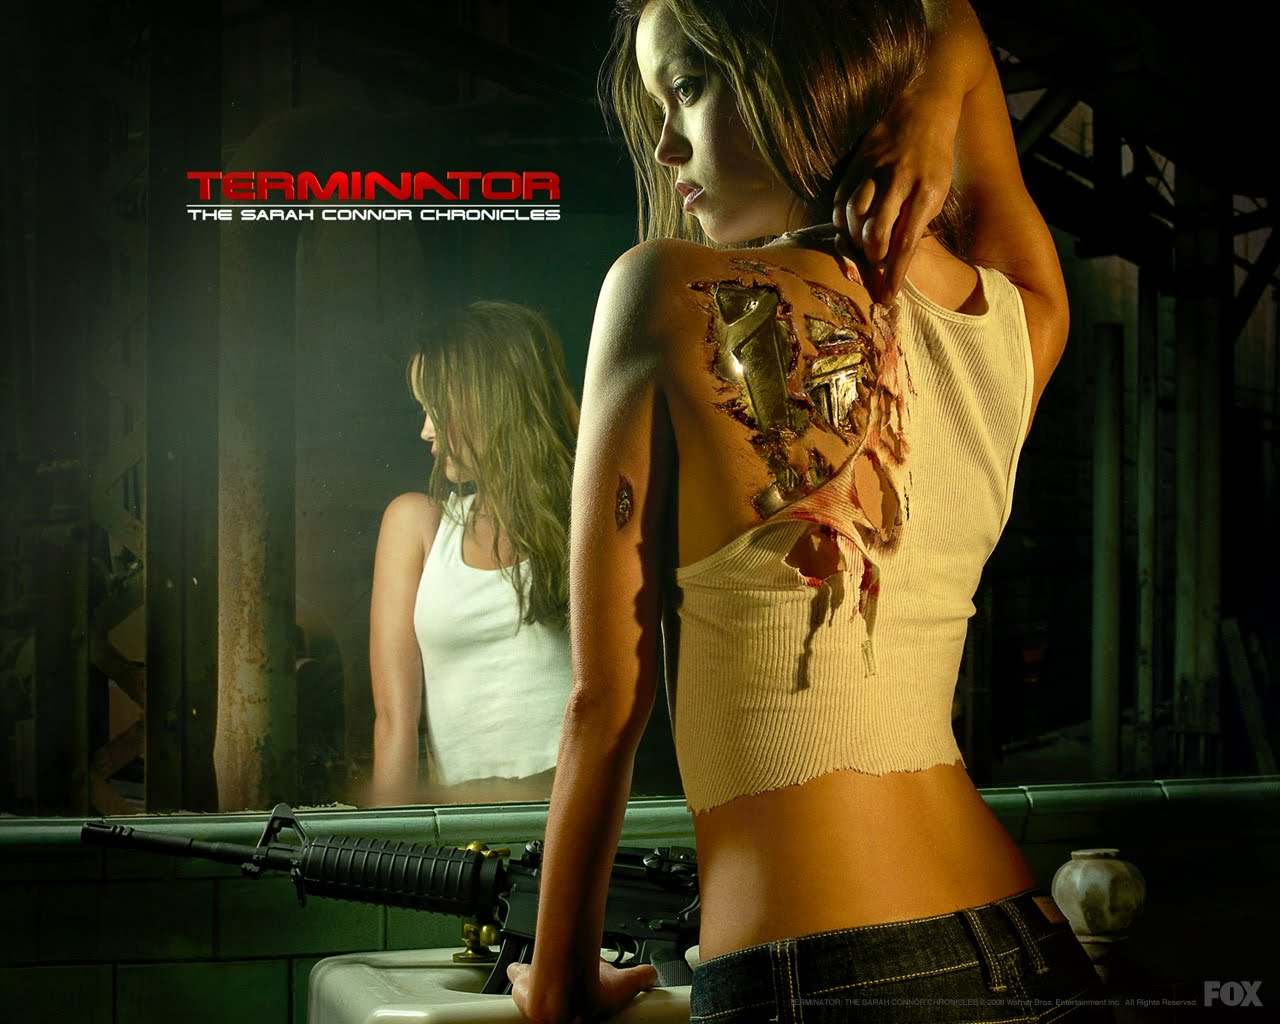 http://3.bp.blogspot.com/_d4m1kUDEkW0/S7z4NAfIO7I/AAAAAAAABHw/0Q6cGrDRUNM/s1600/terminator-the-sarah-connor-chronicles.jpg